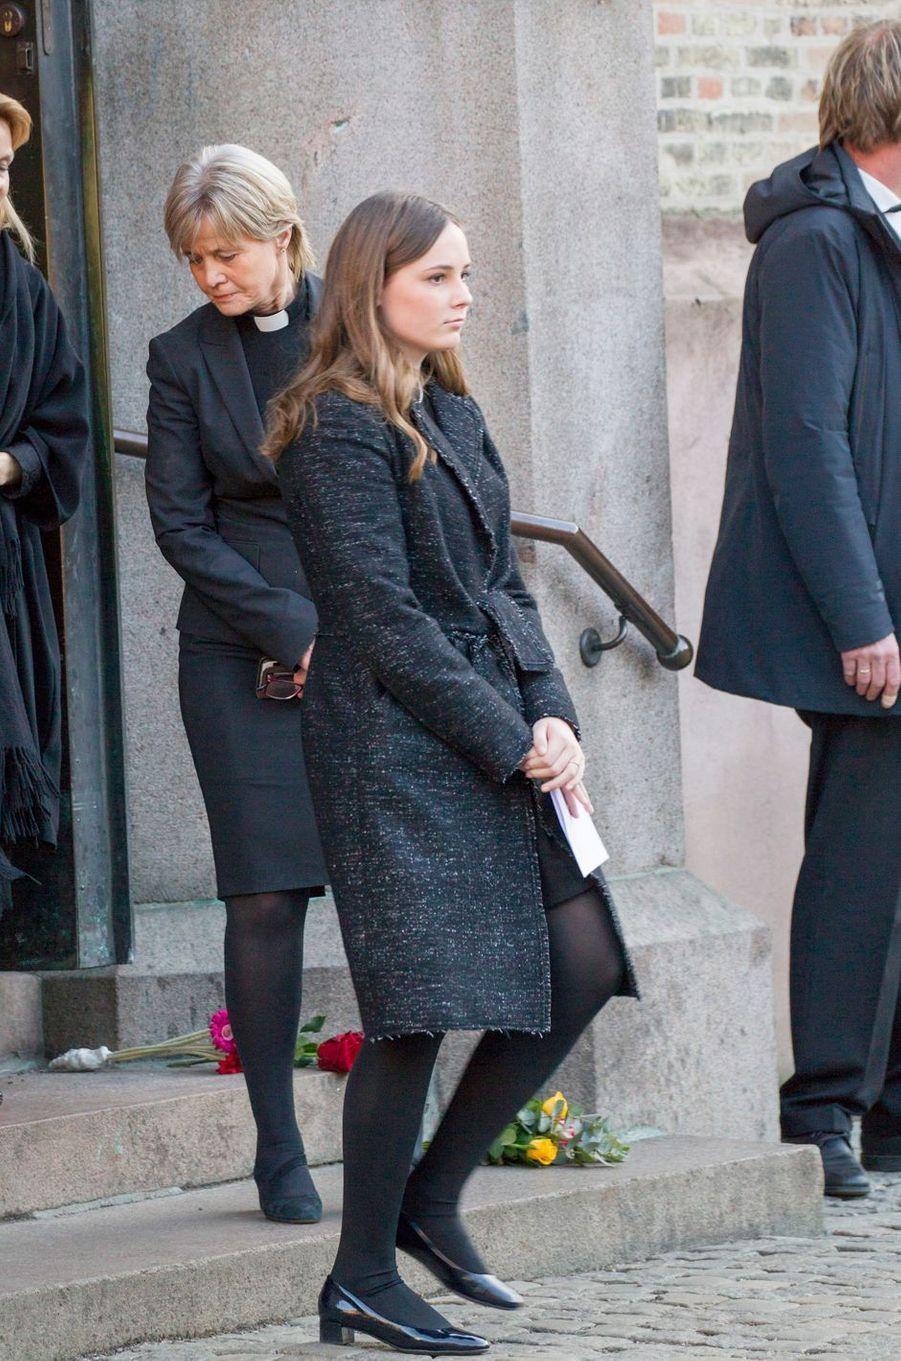 La princesse Ingrid Alexandra de Norvège, à Oslo le 3 janvier 2019